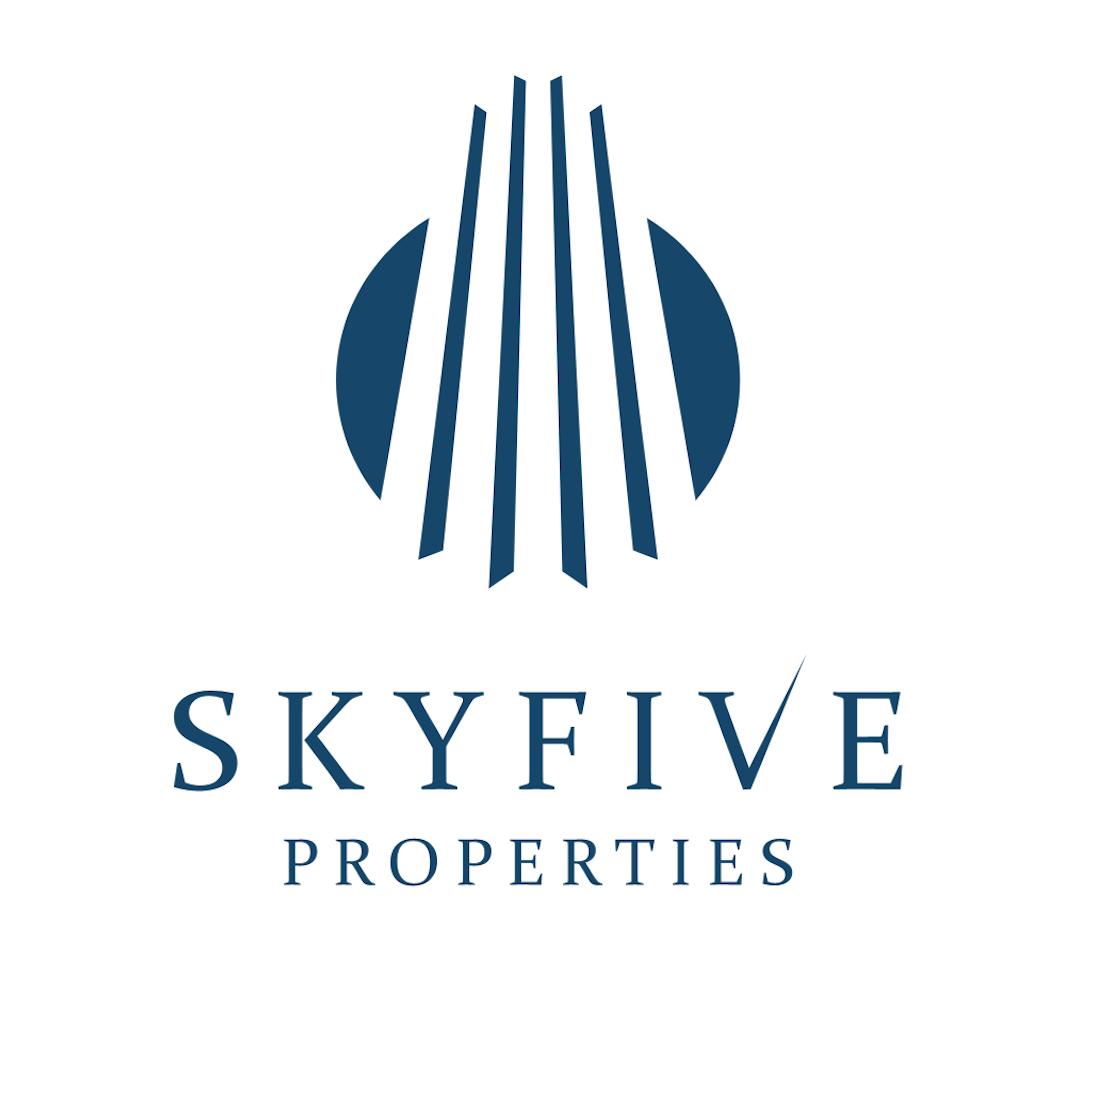 Sky Five Properties - Miami Beach, FL - Real Estate Agents